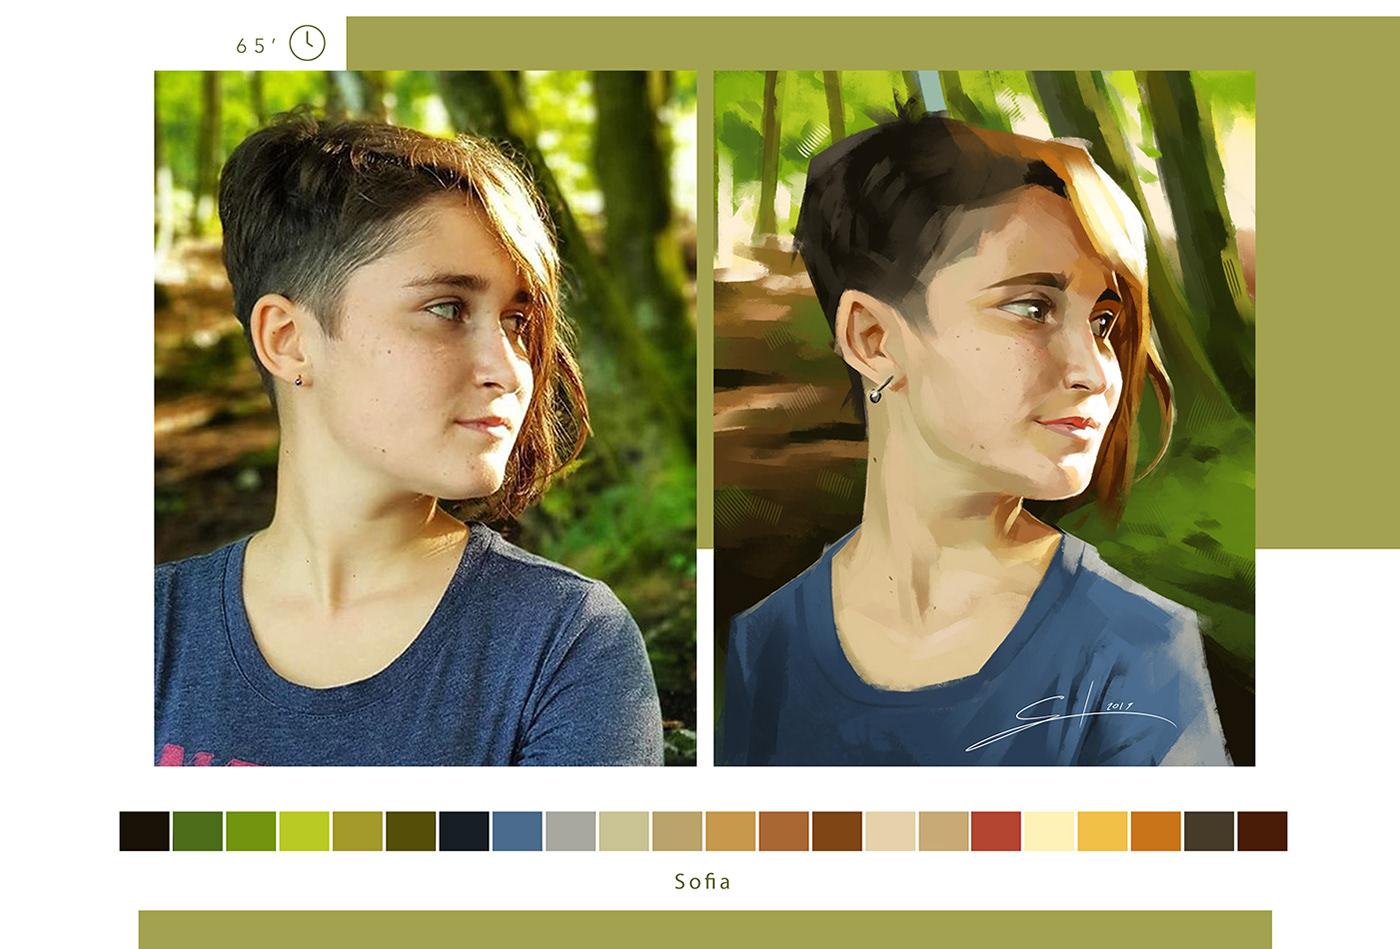 Image may contain: human face, person and screenshot